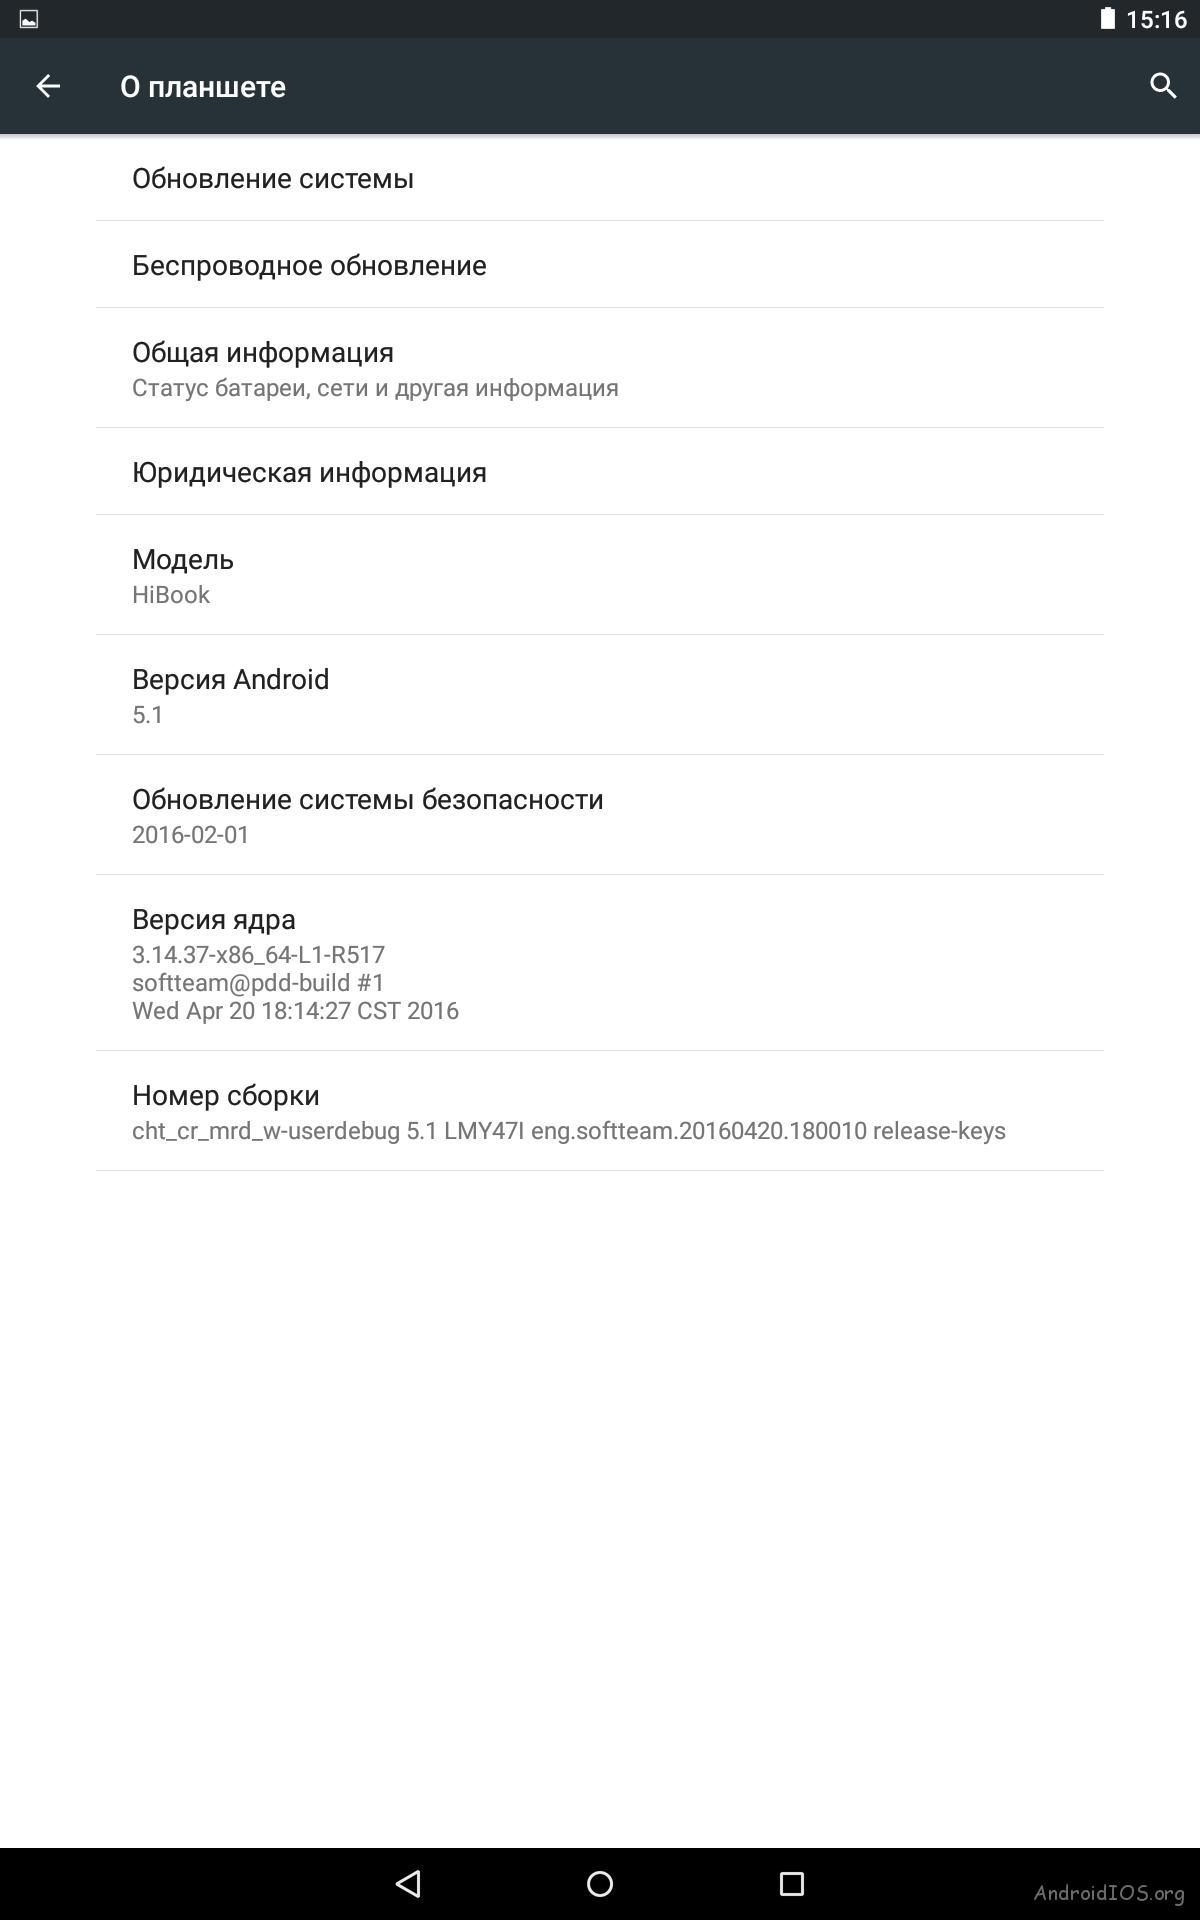 Screenshot_2016-05-10-15-16-29